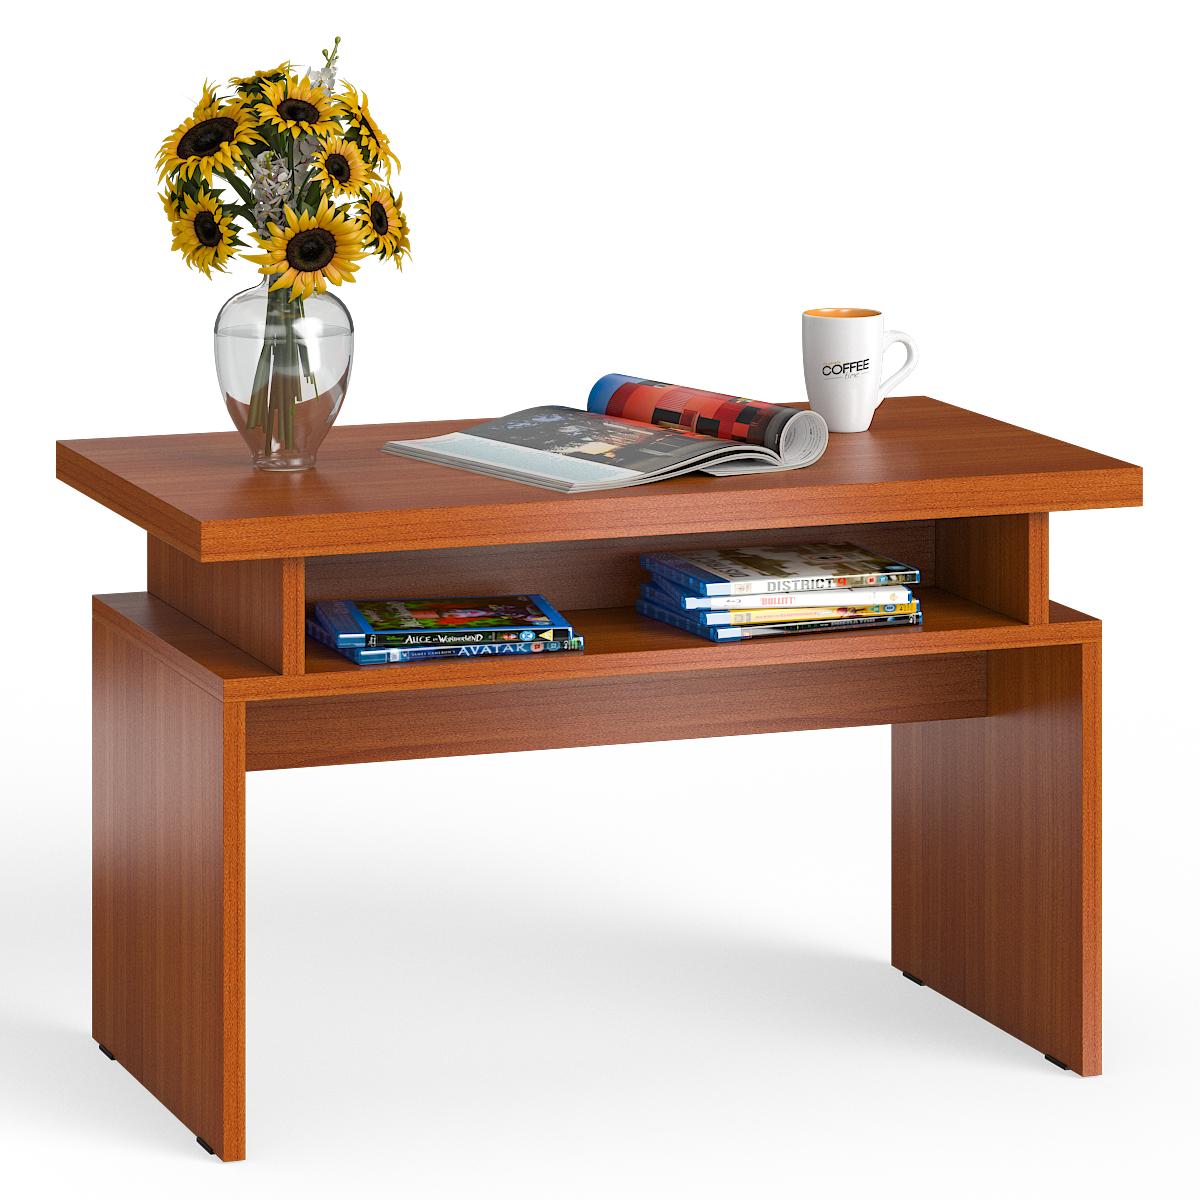 Стол журнальный Мебельный Двор СЖ-13 вишня, 80,5х45,5х50 см